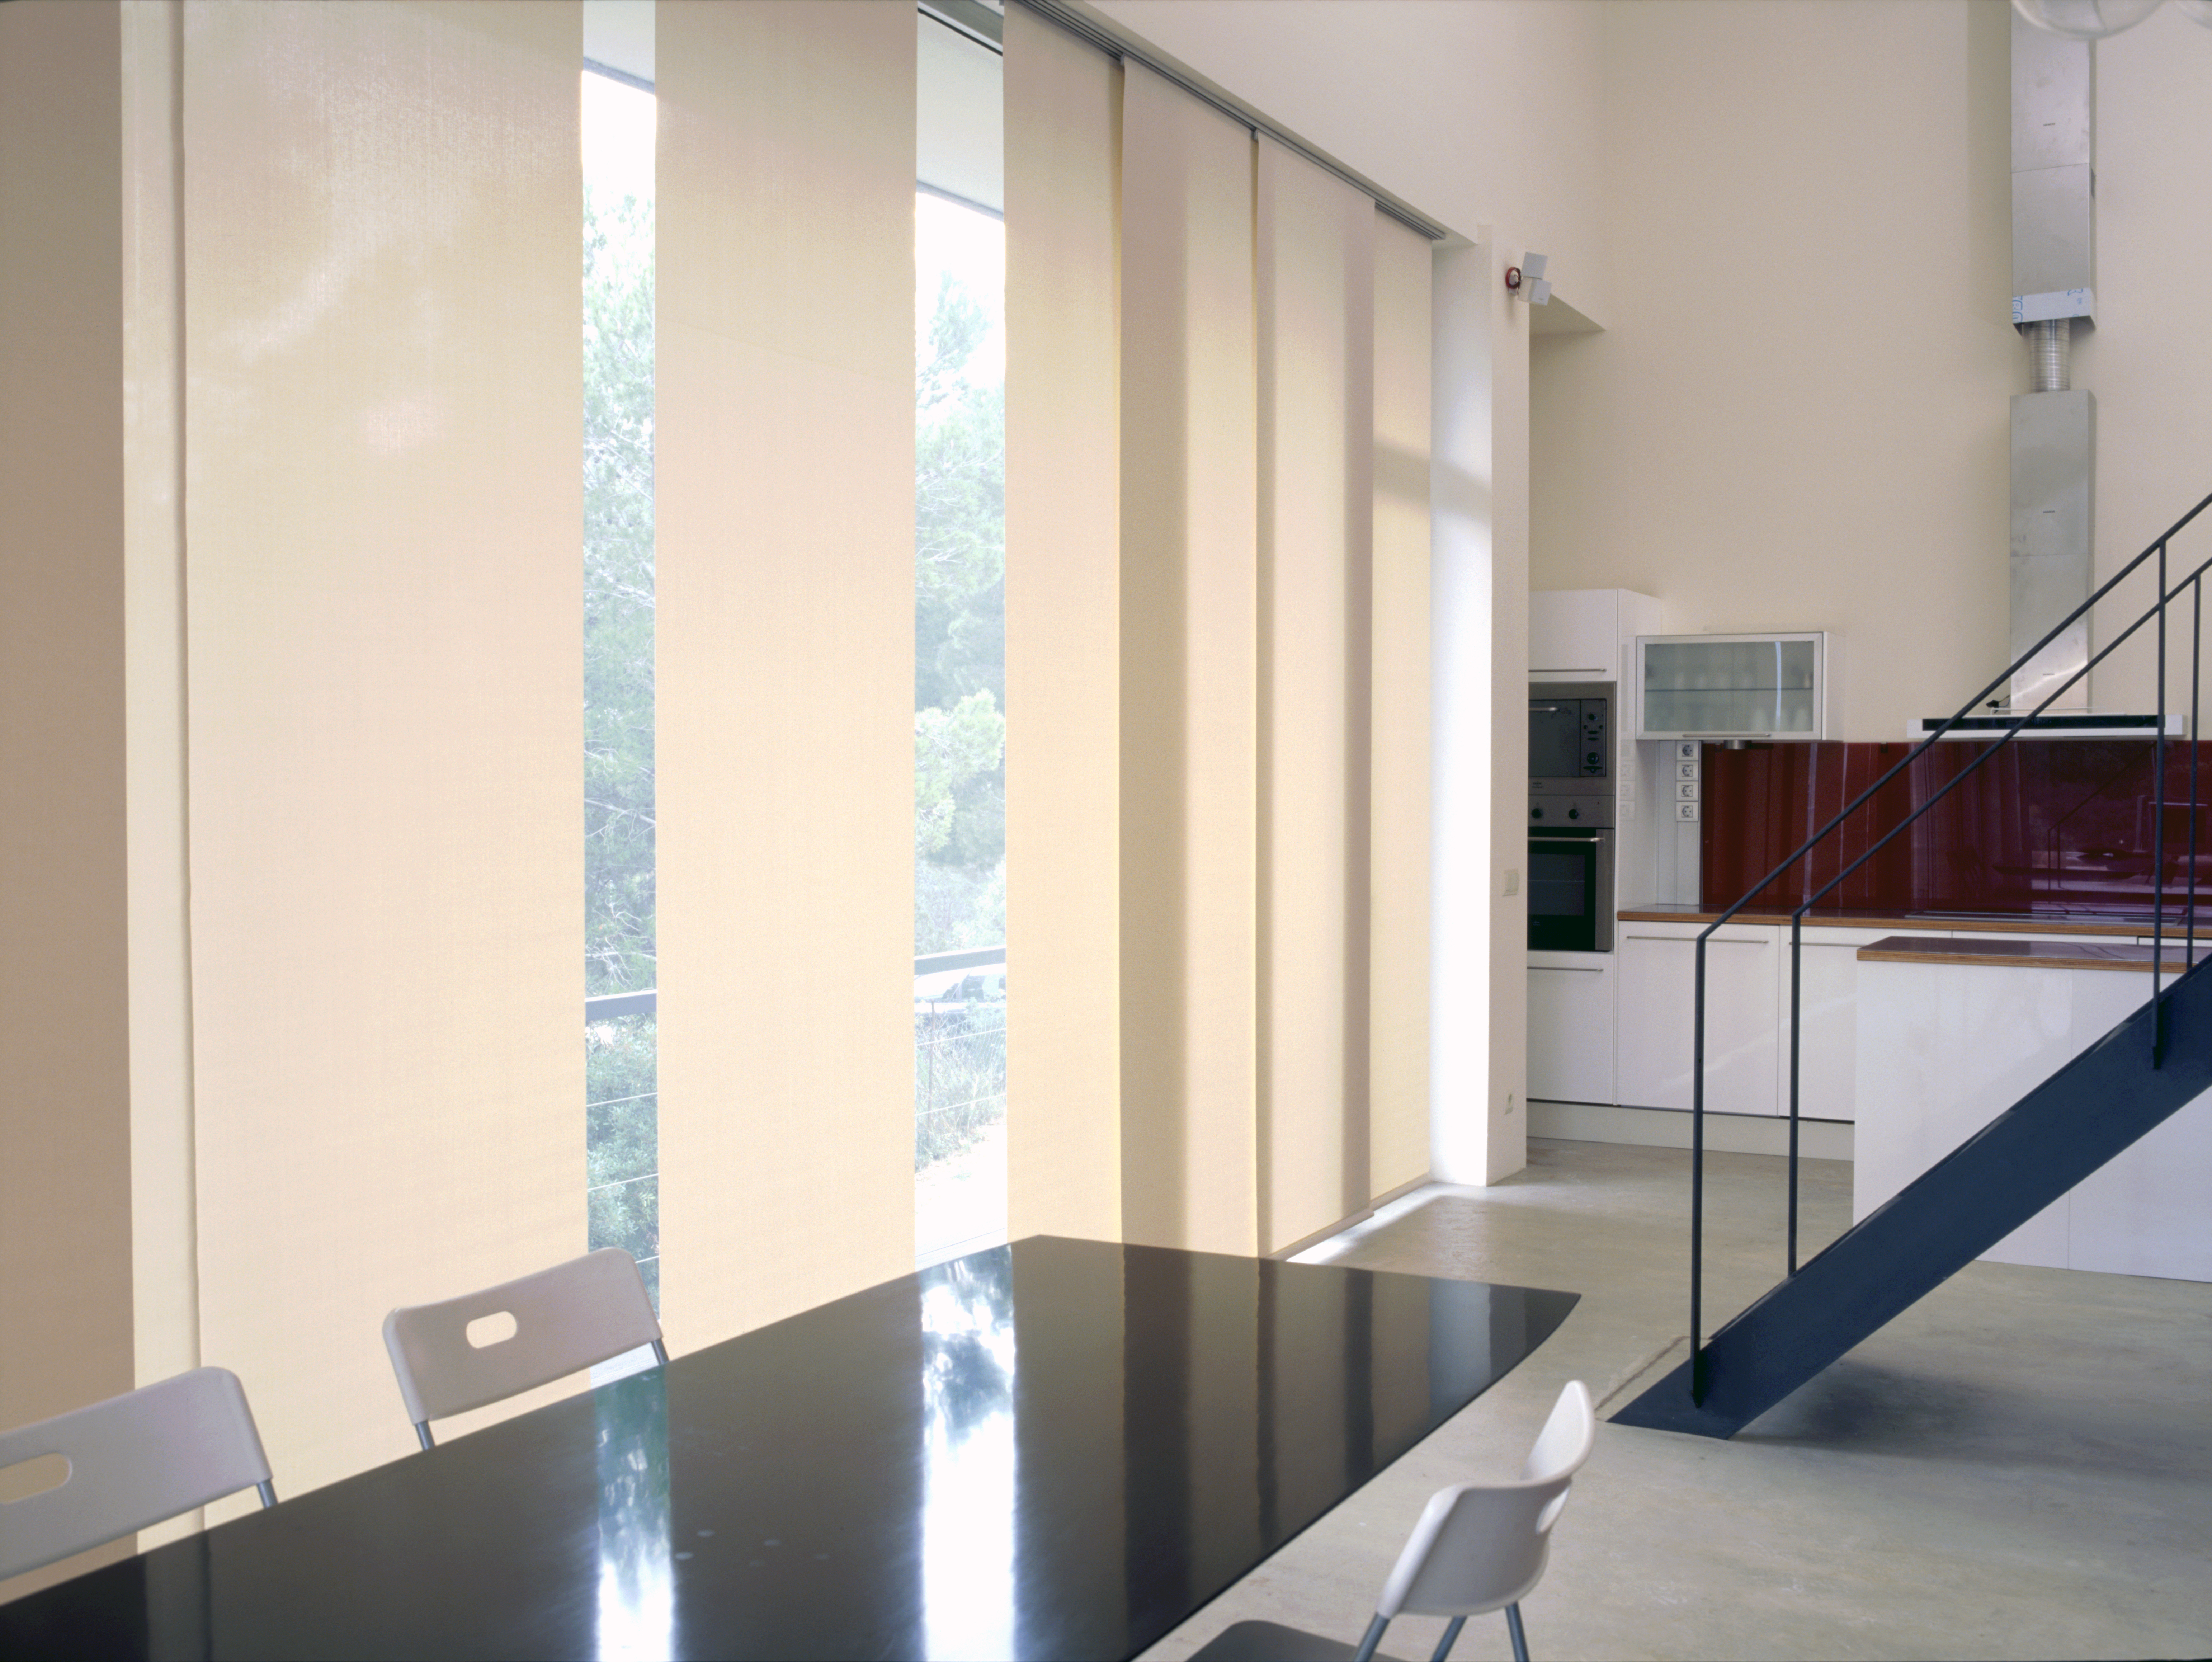 Siding Panels